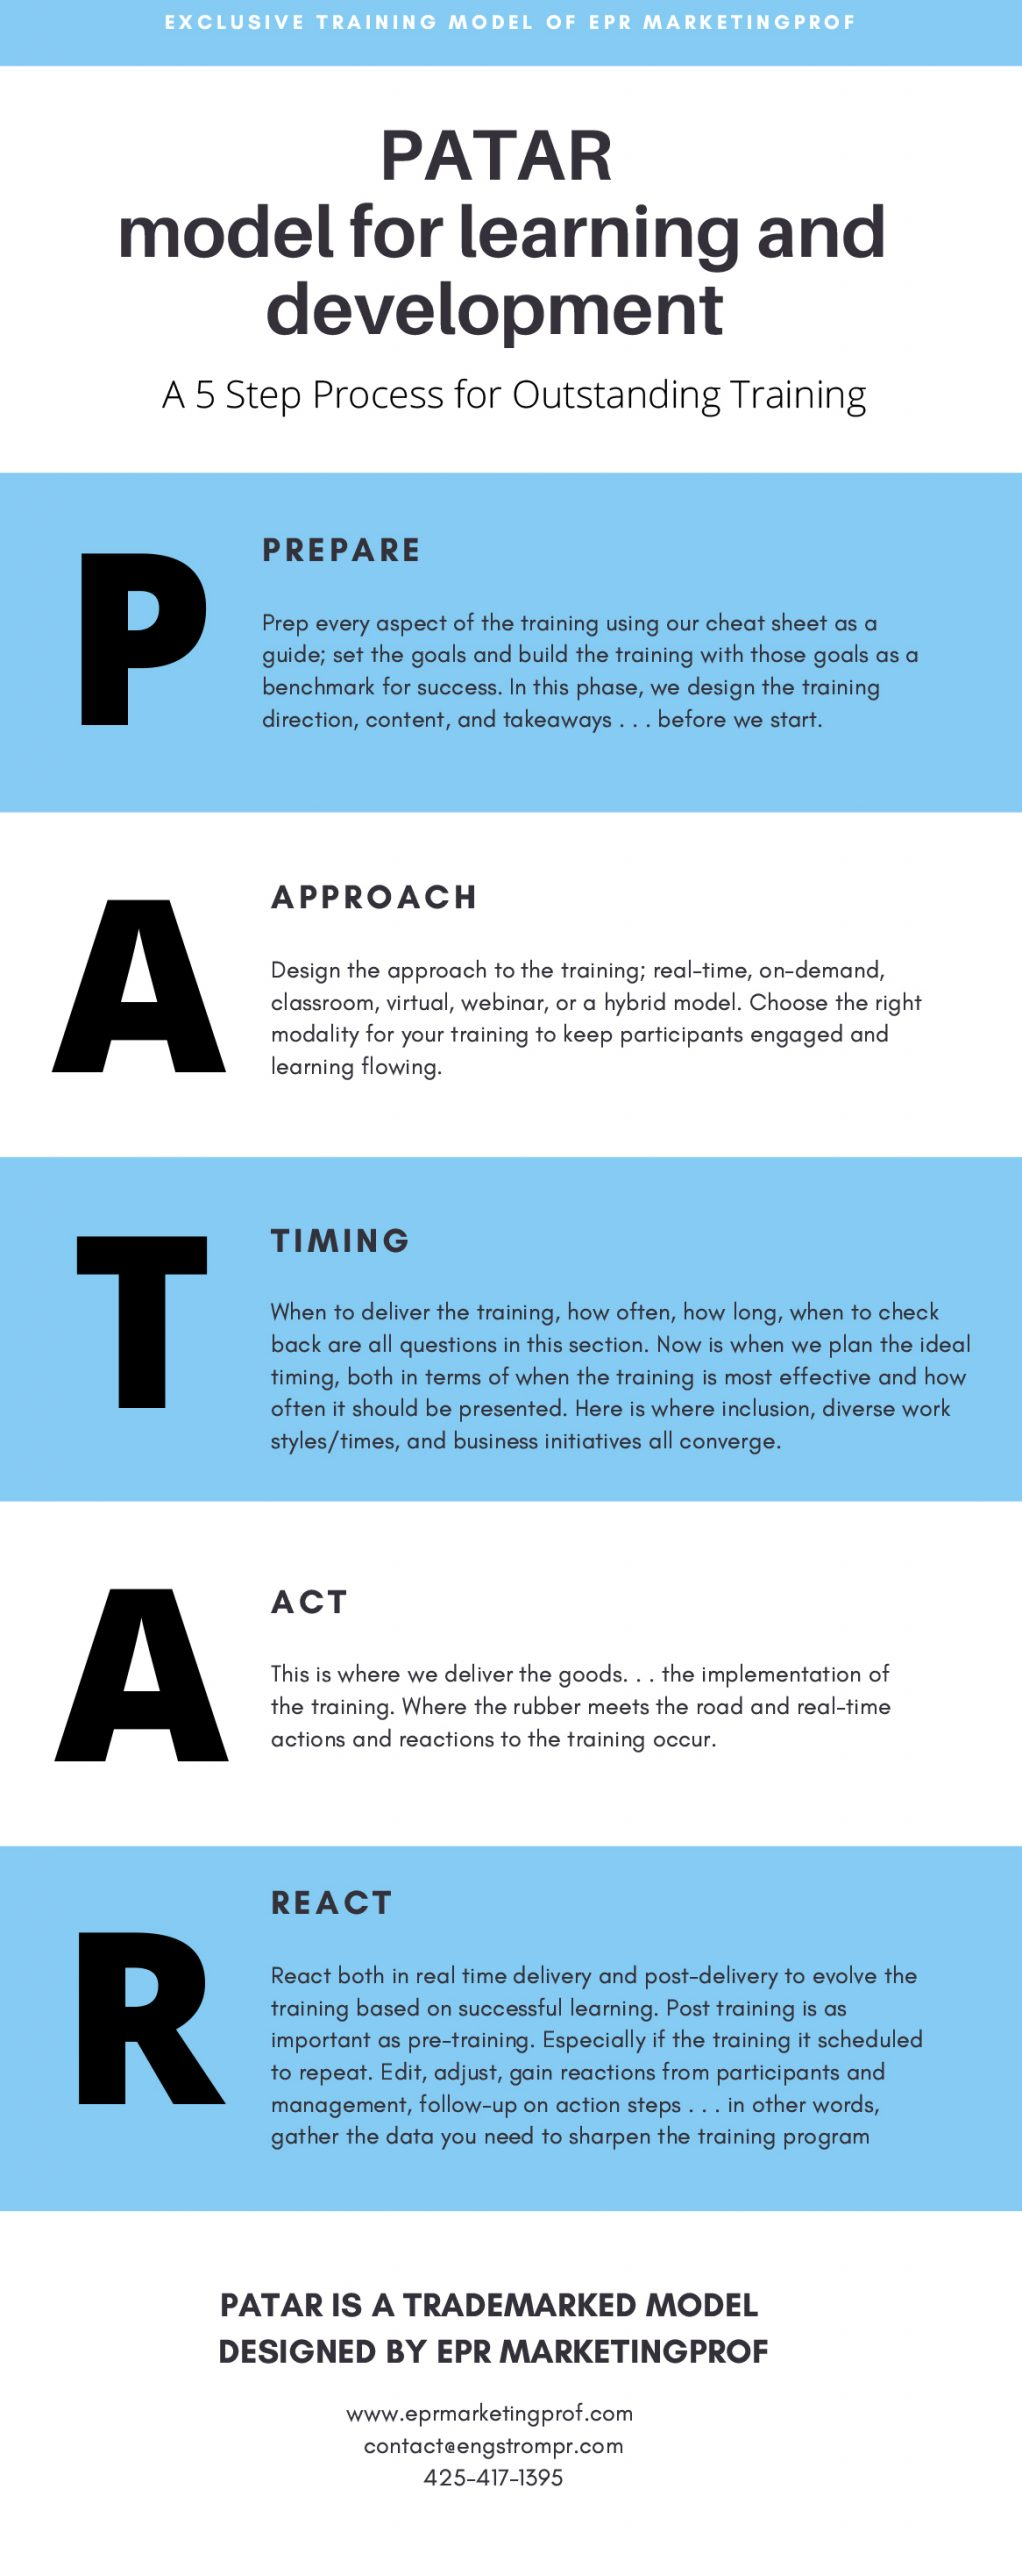 PATAR - Model for learning development